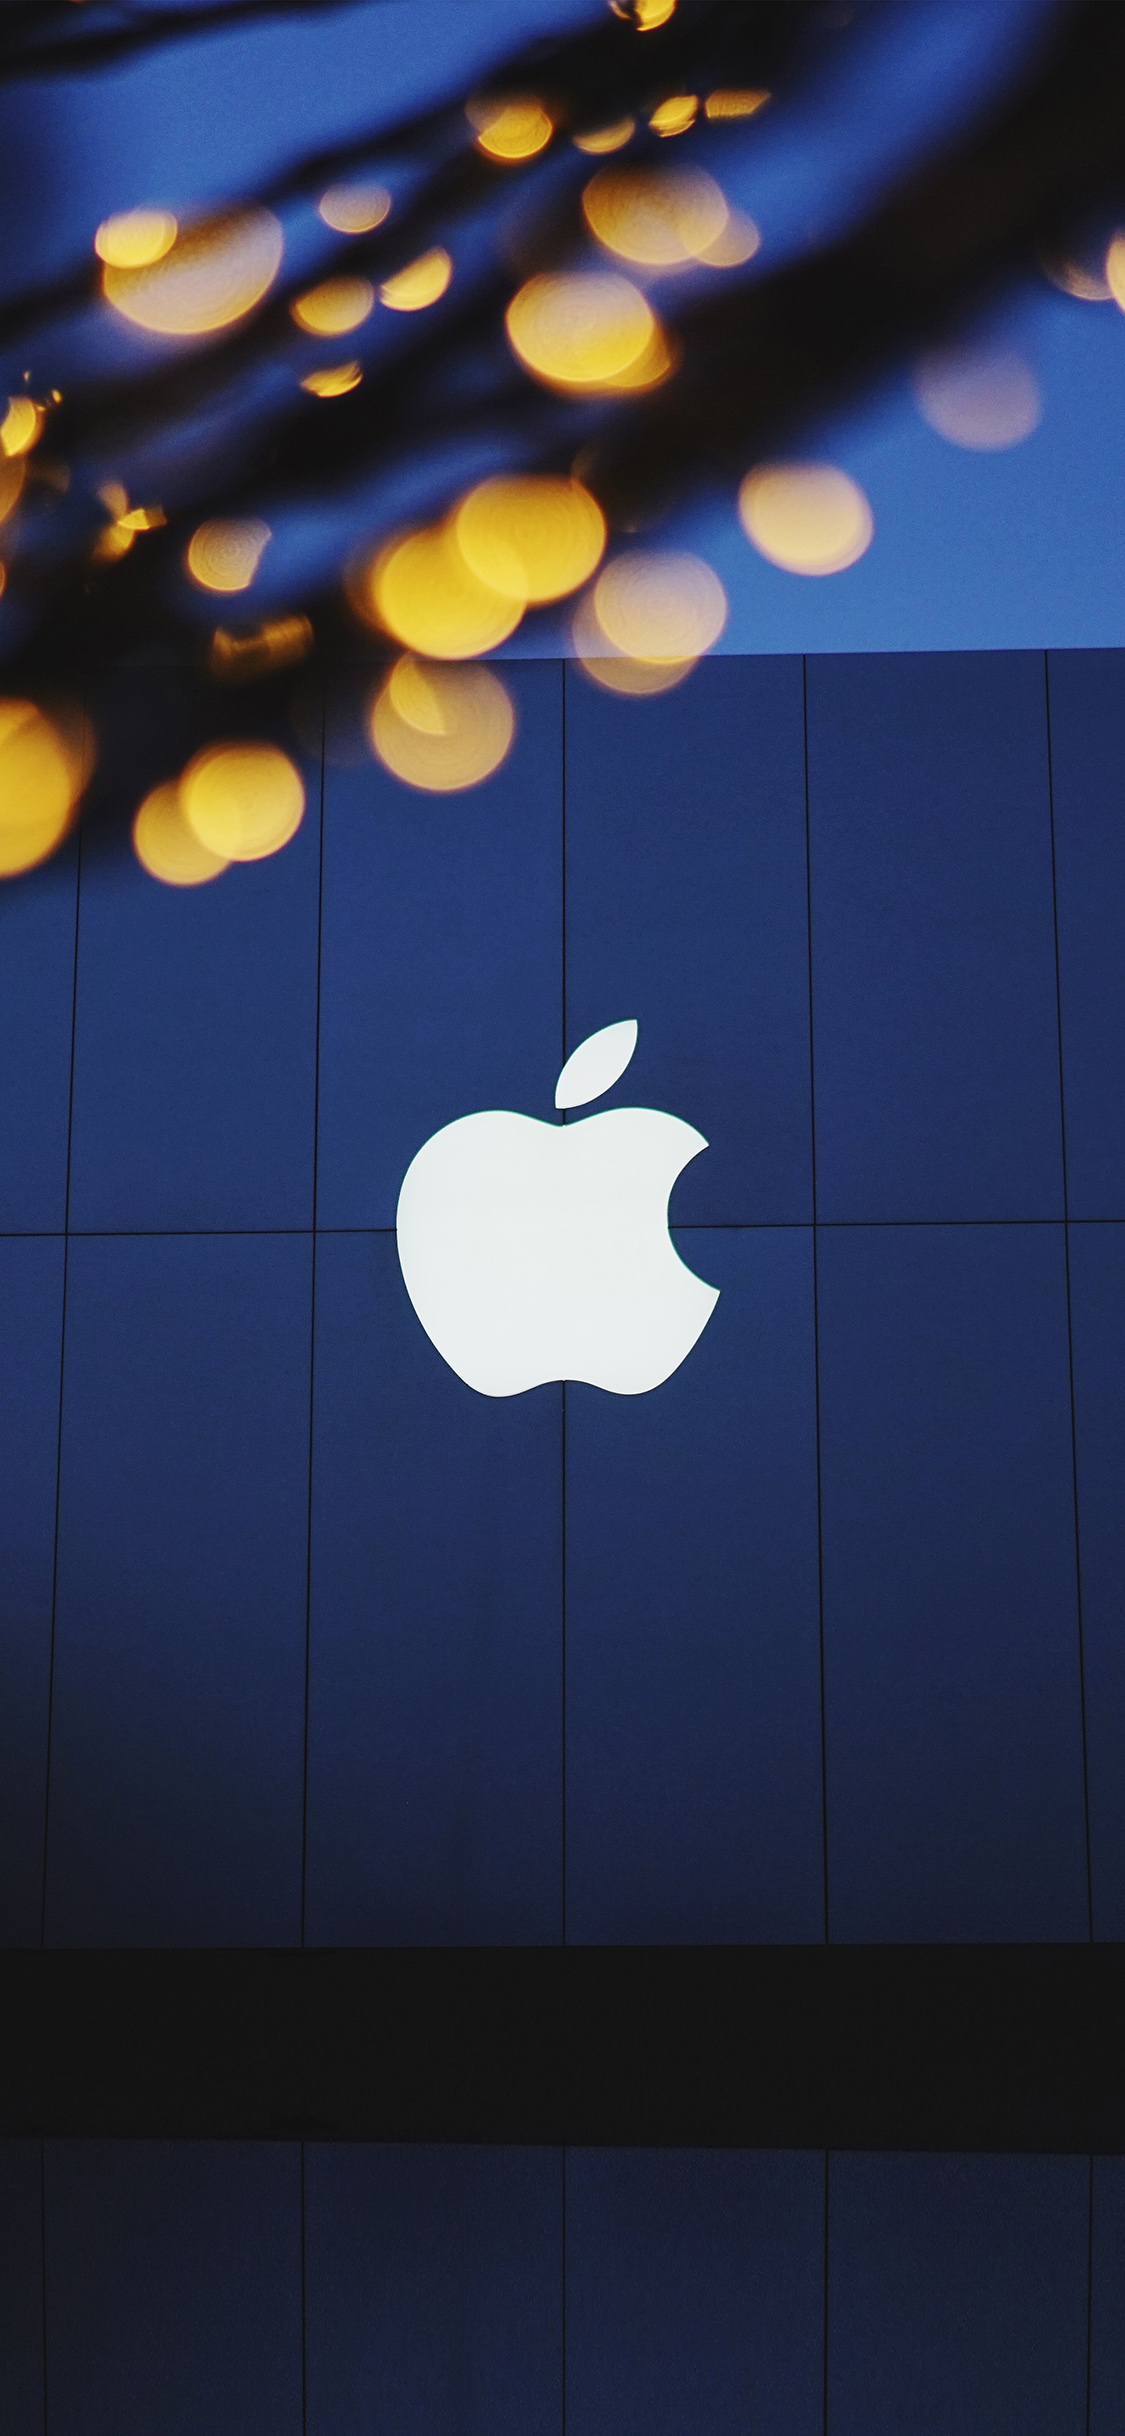 iphonexpapers | iphone x wallpaper | ng07-apple-logo-blue-dark